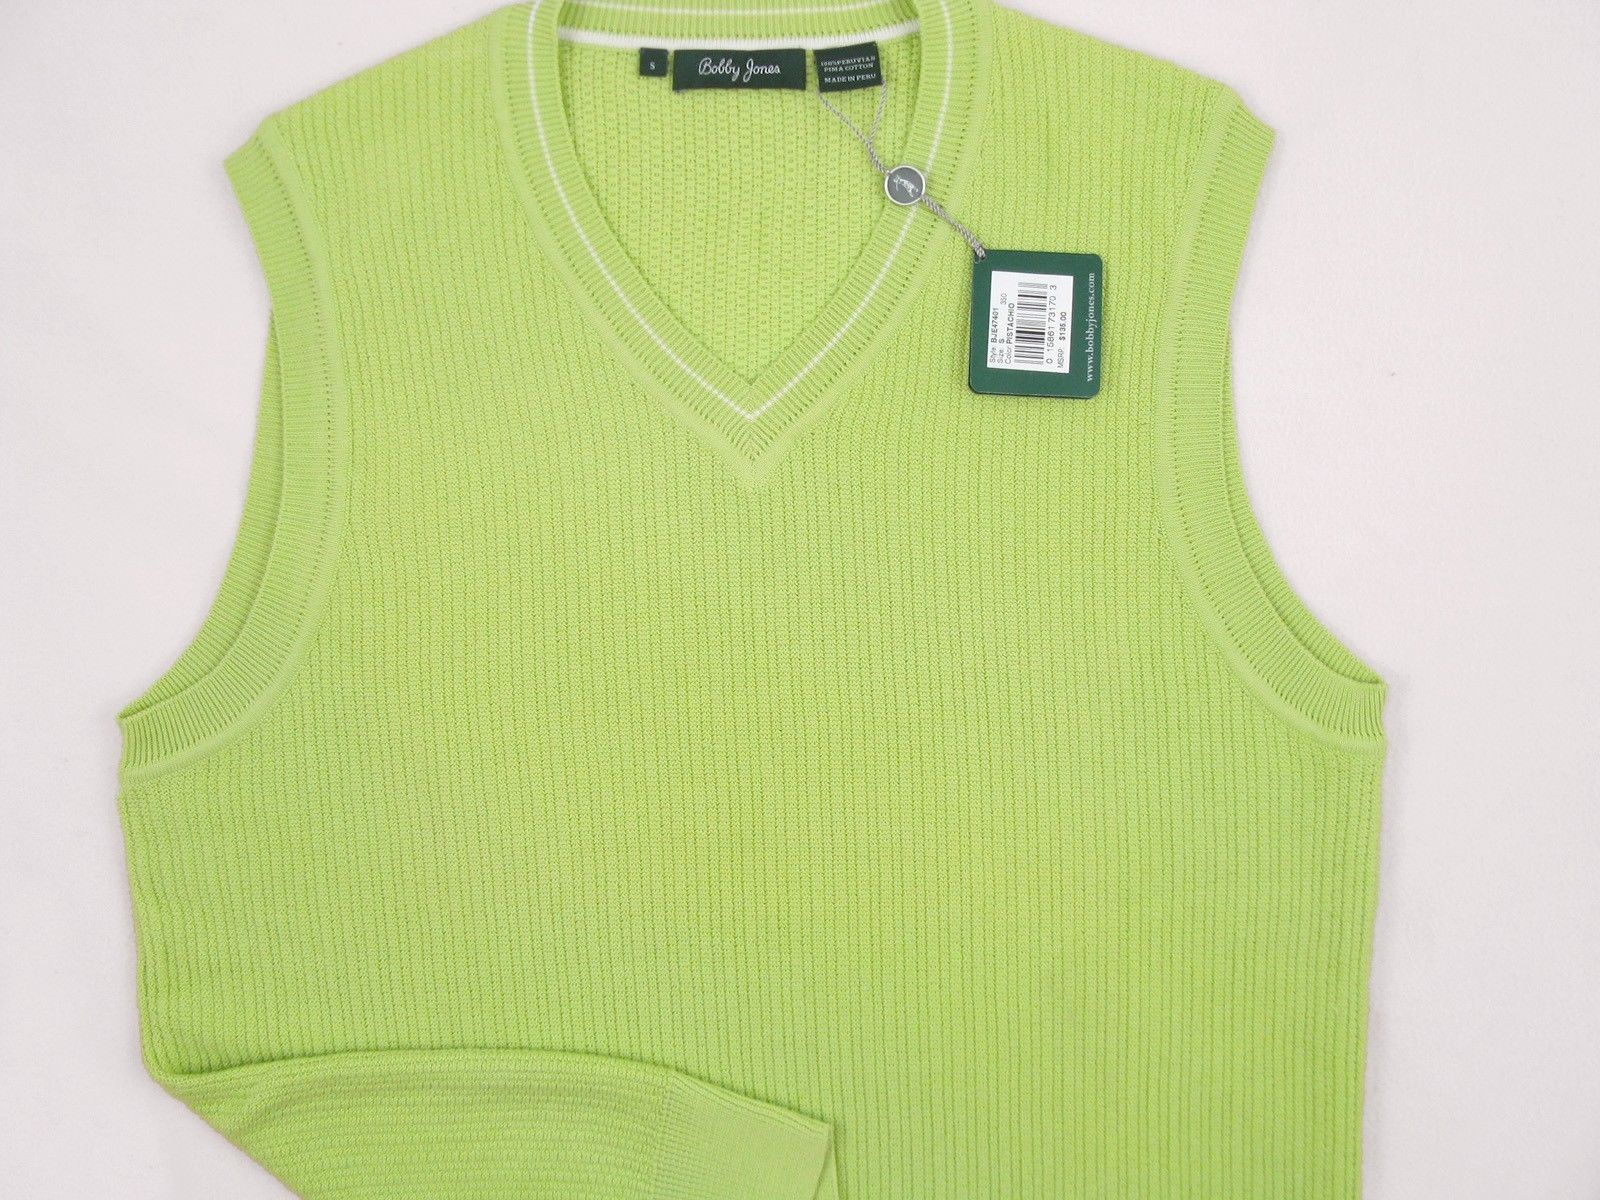 NEW! NWT! $135 Bobby Jones Collection Colorful Vest! 100% Peruvian Pima Cotton image 4